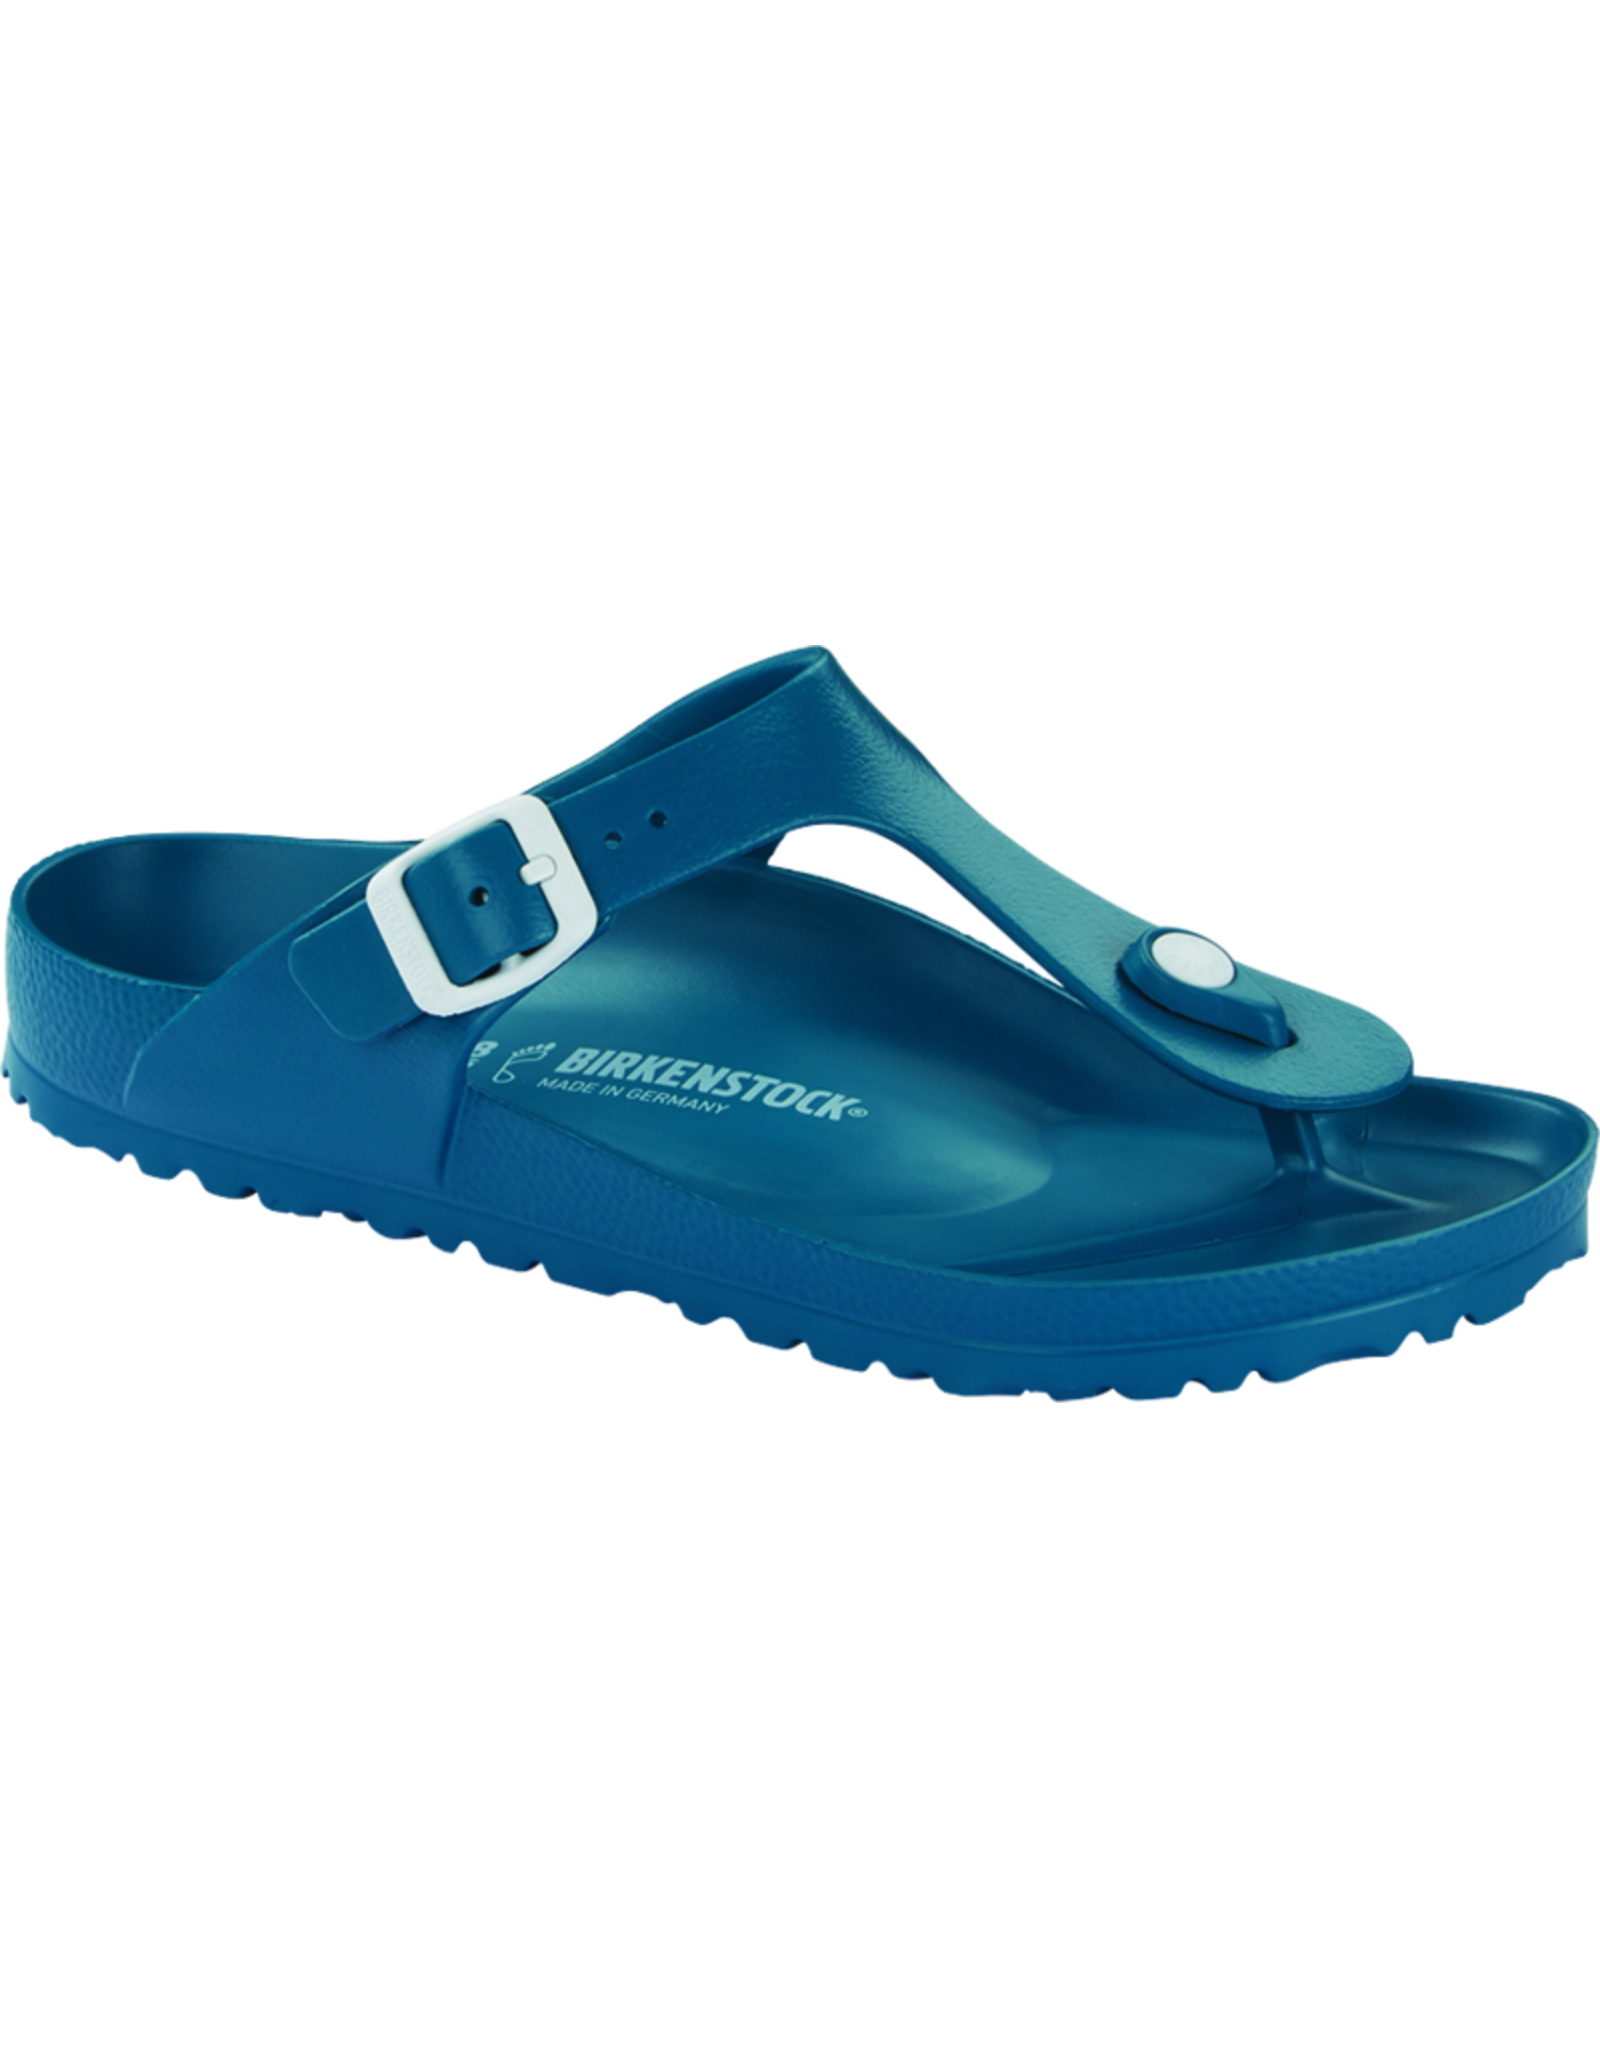 Birkenstock Gizeh EVA Sandal-Turquoise